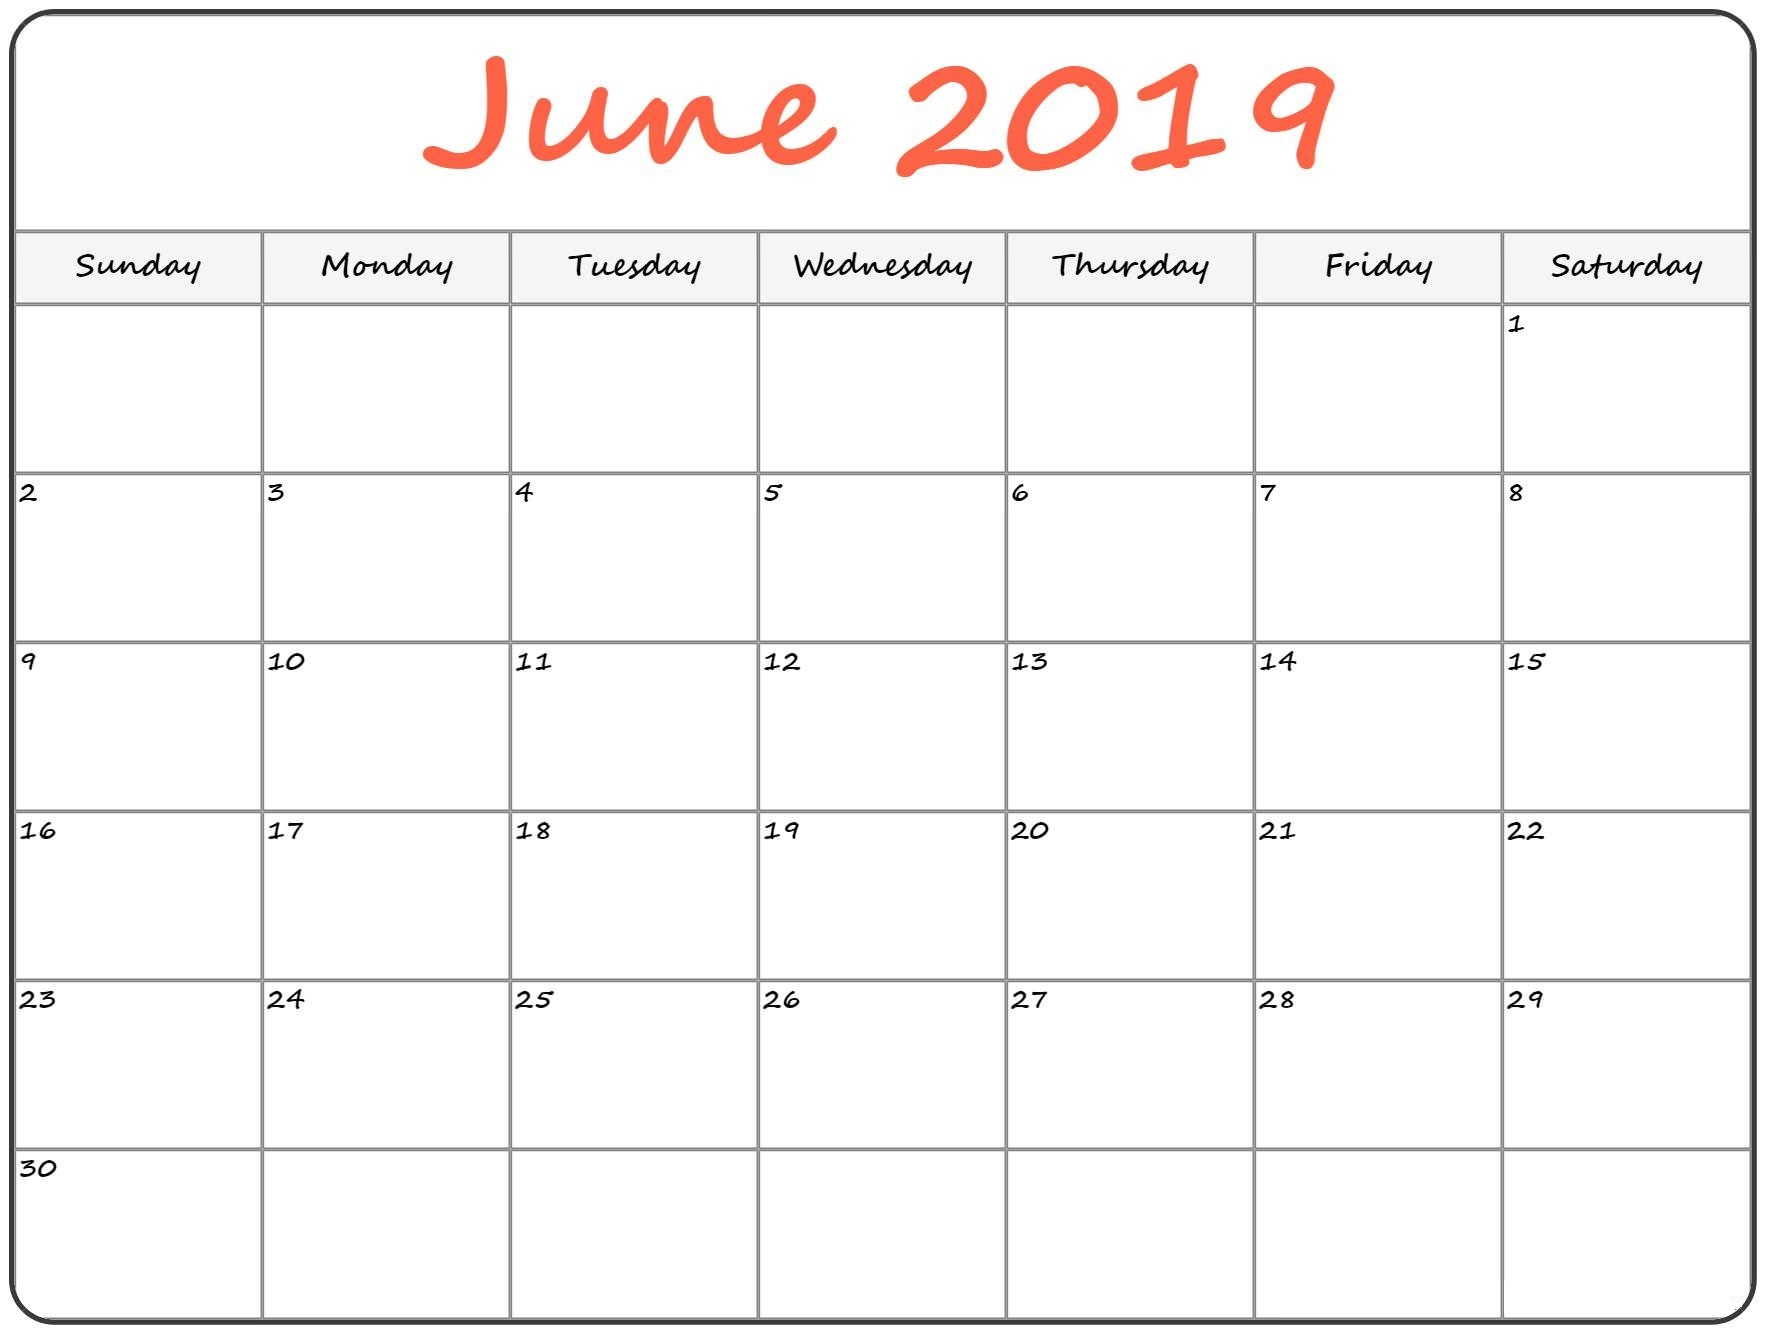 Printable Calendar For June 2019